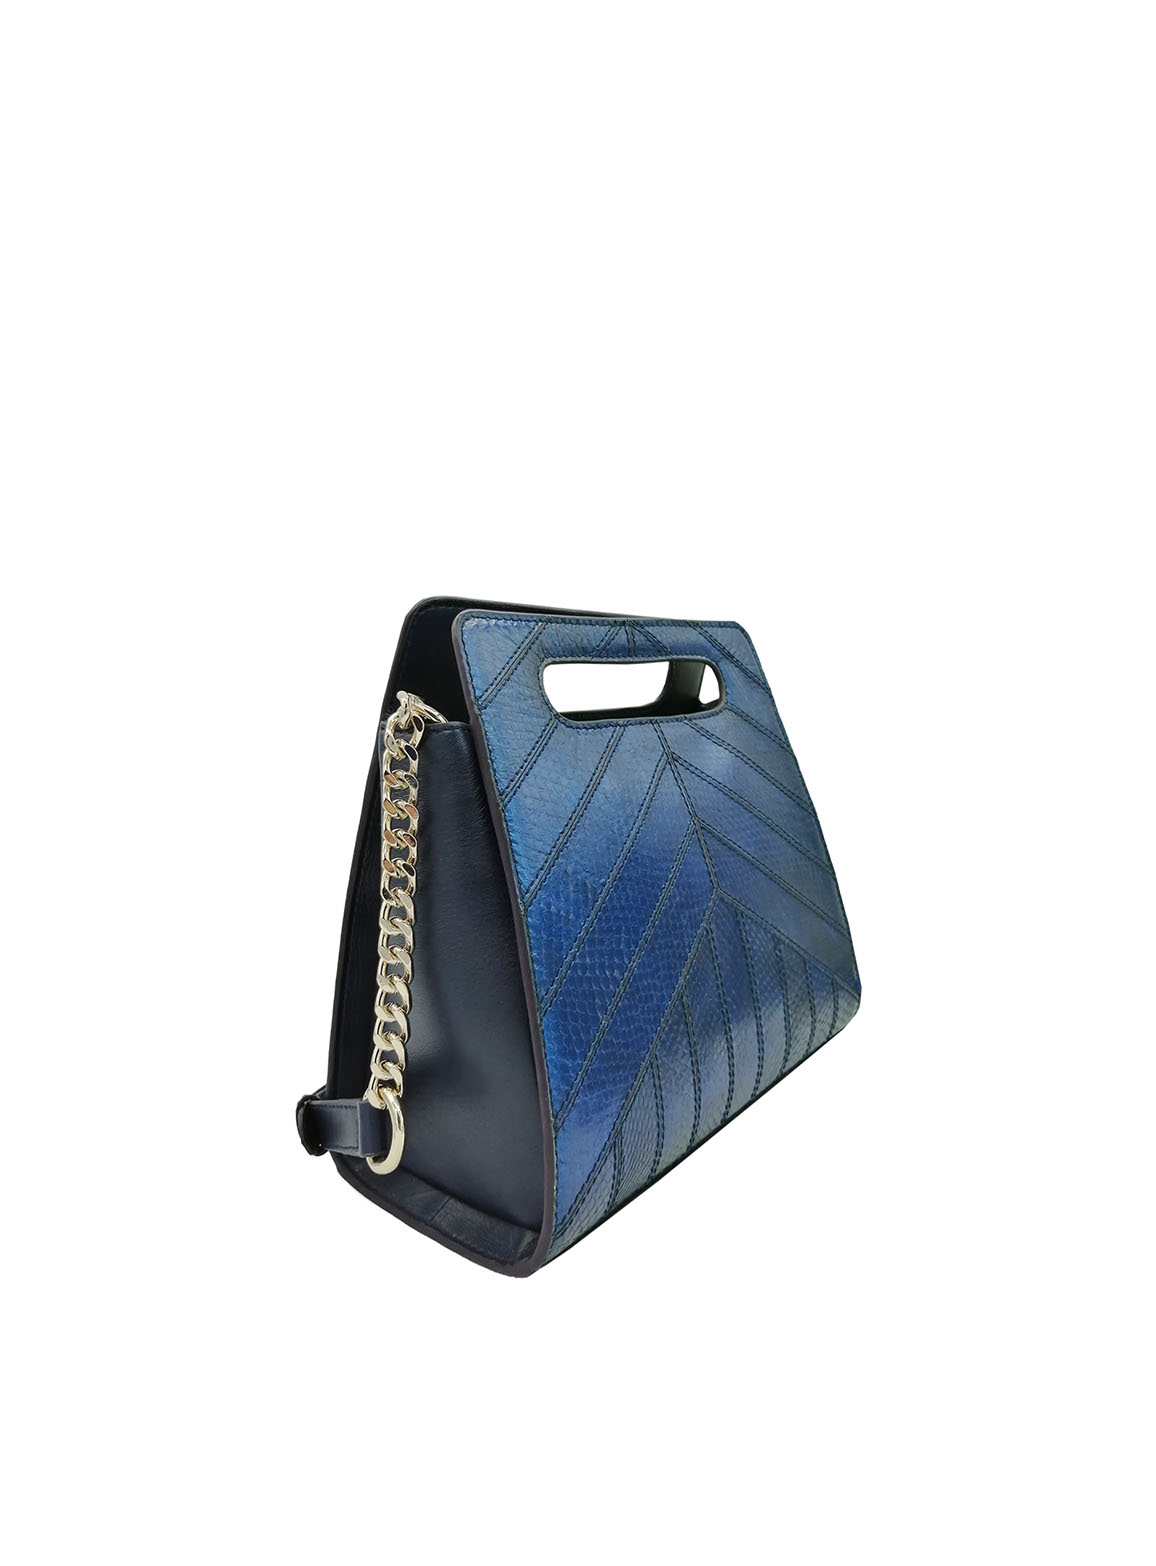 Raphaelle bag